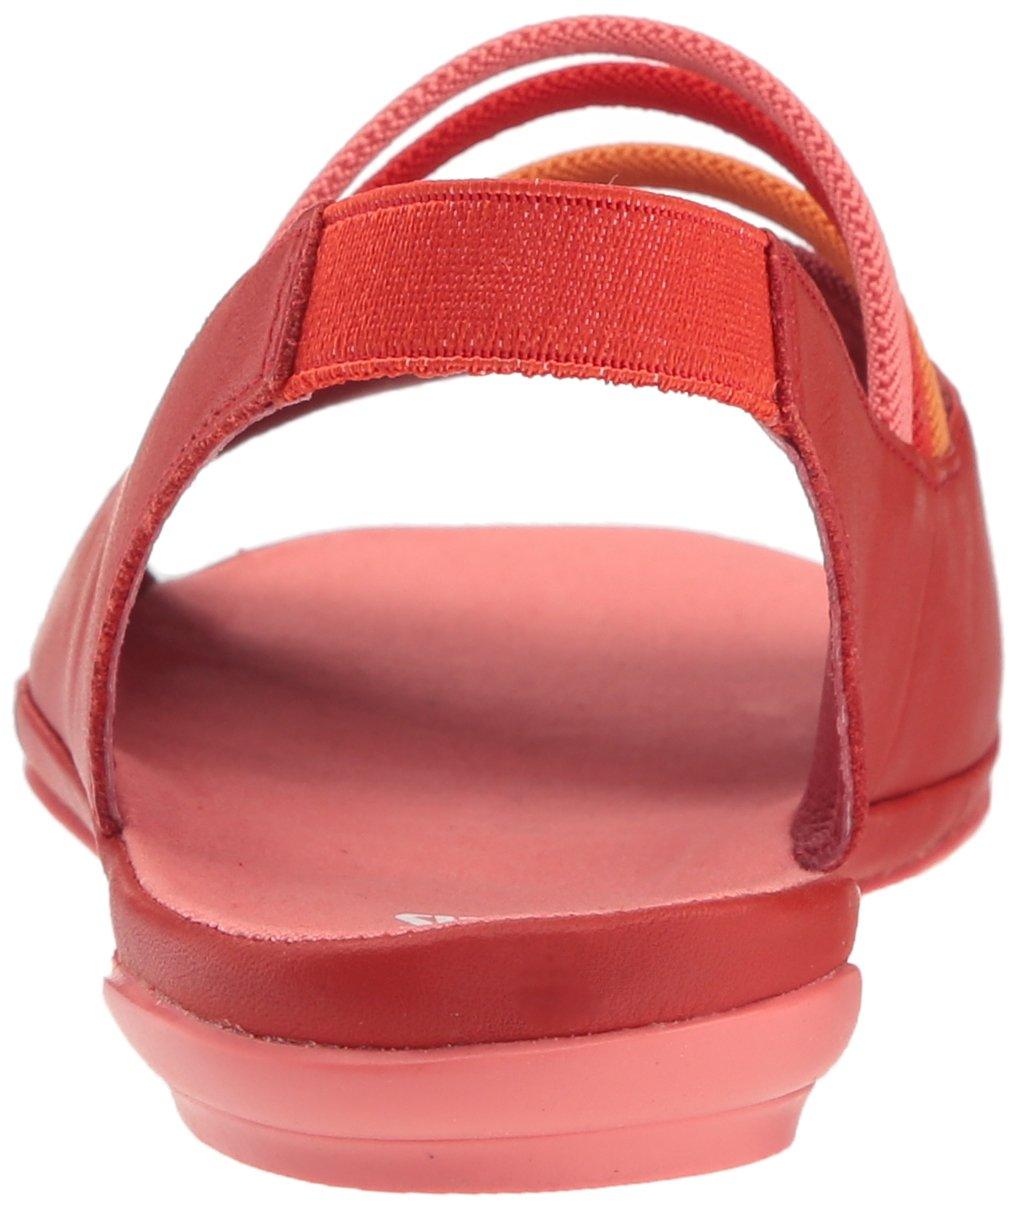 Sandalias Camper 4035 TWS Camper B00SSWU82W K200620 para mujer rojo ...